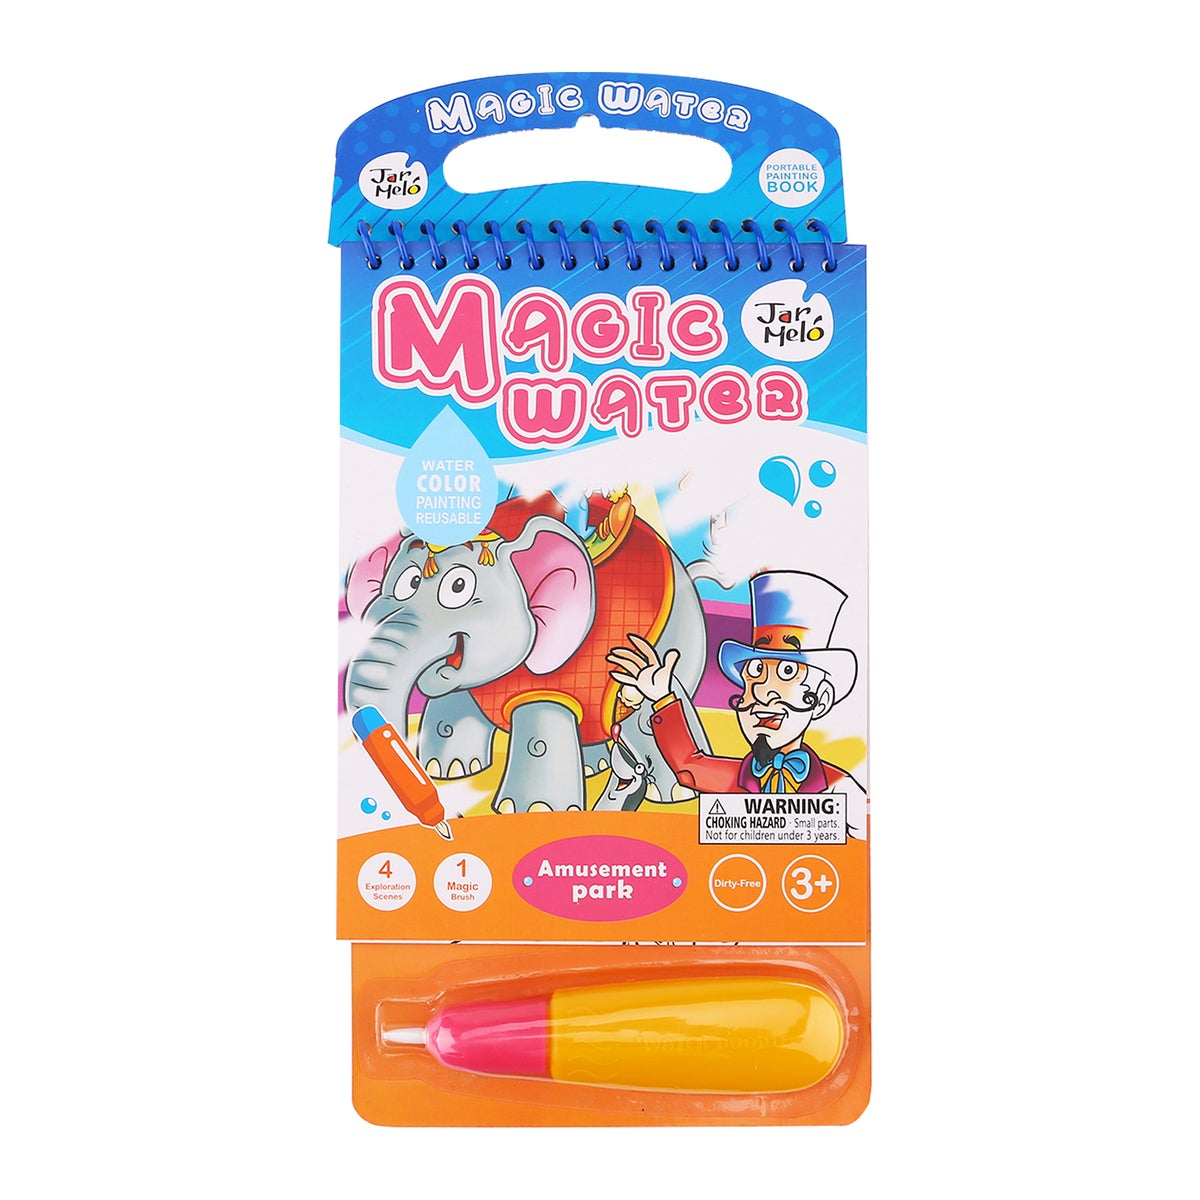 JarMelo - Magic Water Colouring Pad - Amusement Park